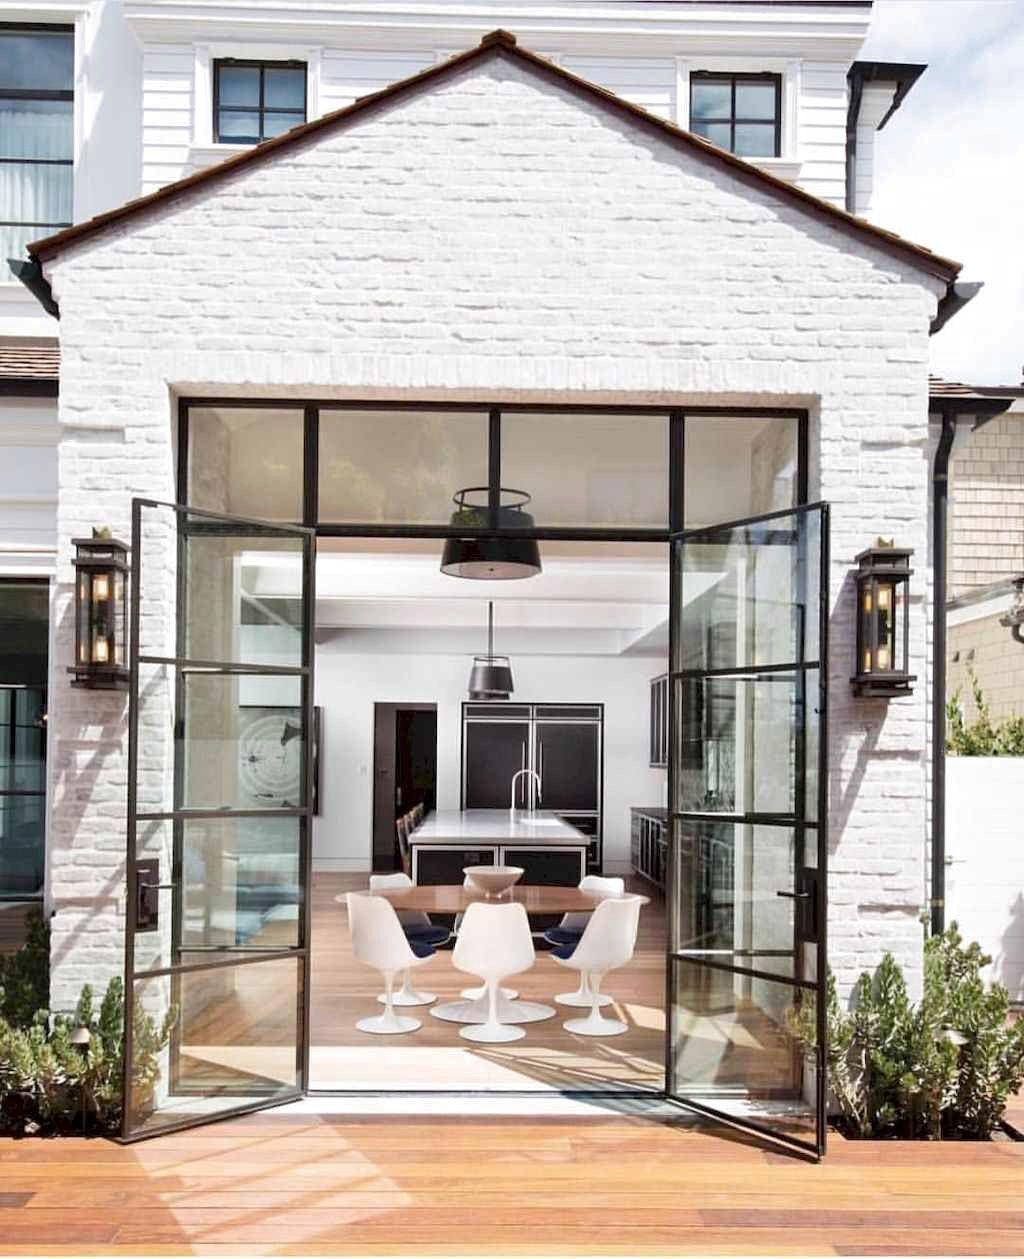 80 Awesome Modern Farmhouse Exterior Design Ideas   White ... on diy home design audio, diy home interior, diy home bathroom, diy home kitchen design, diy home living room,